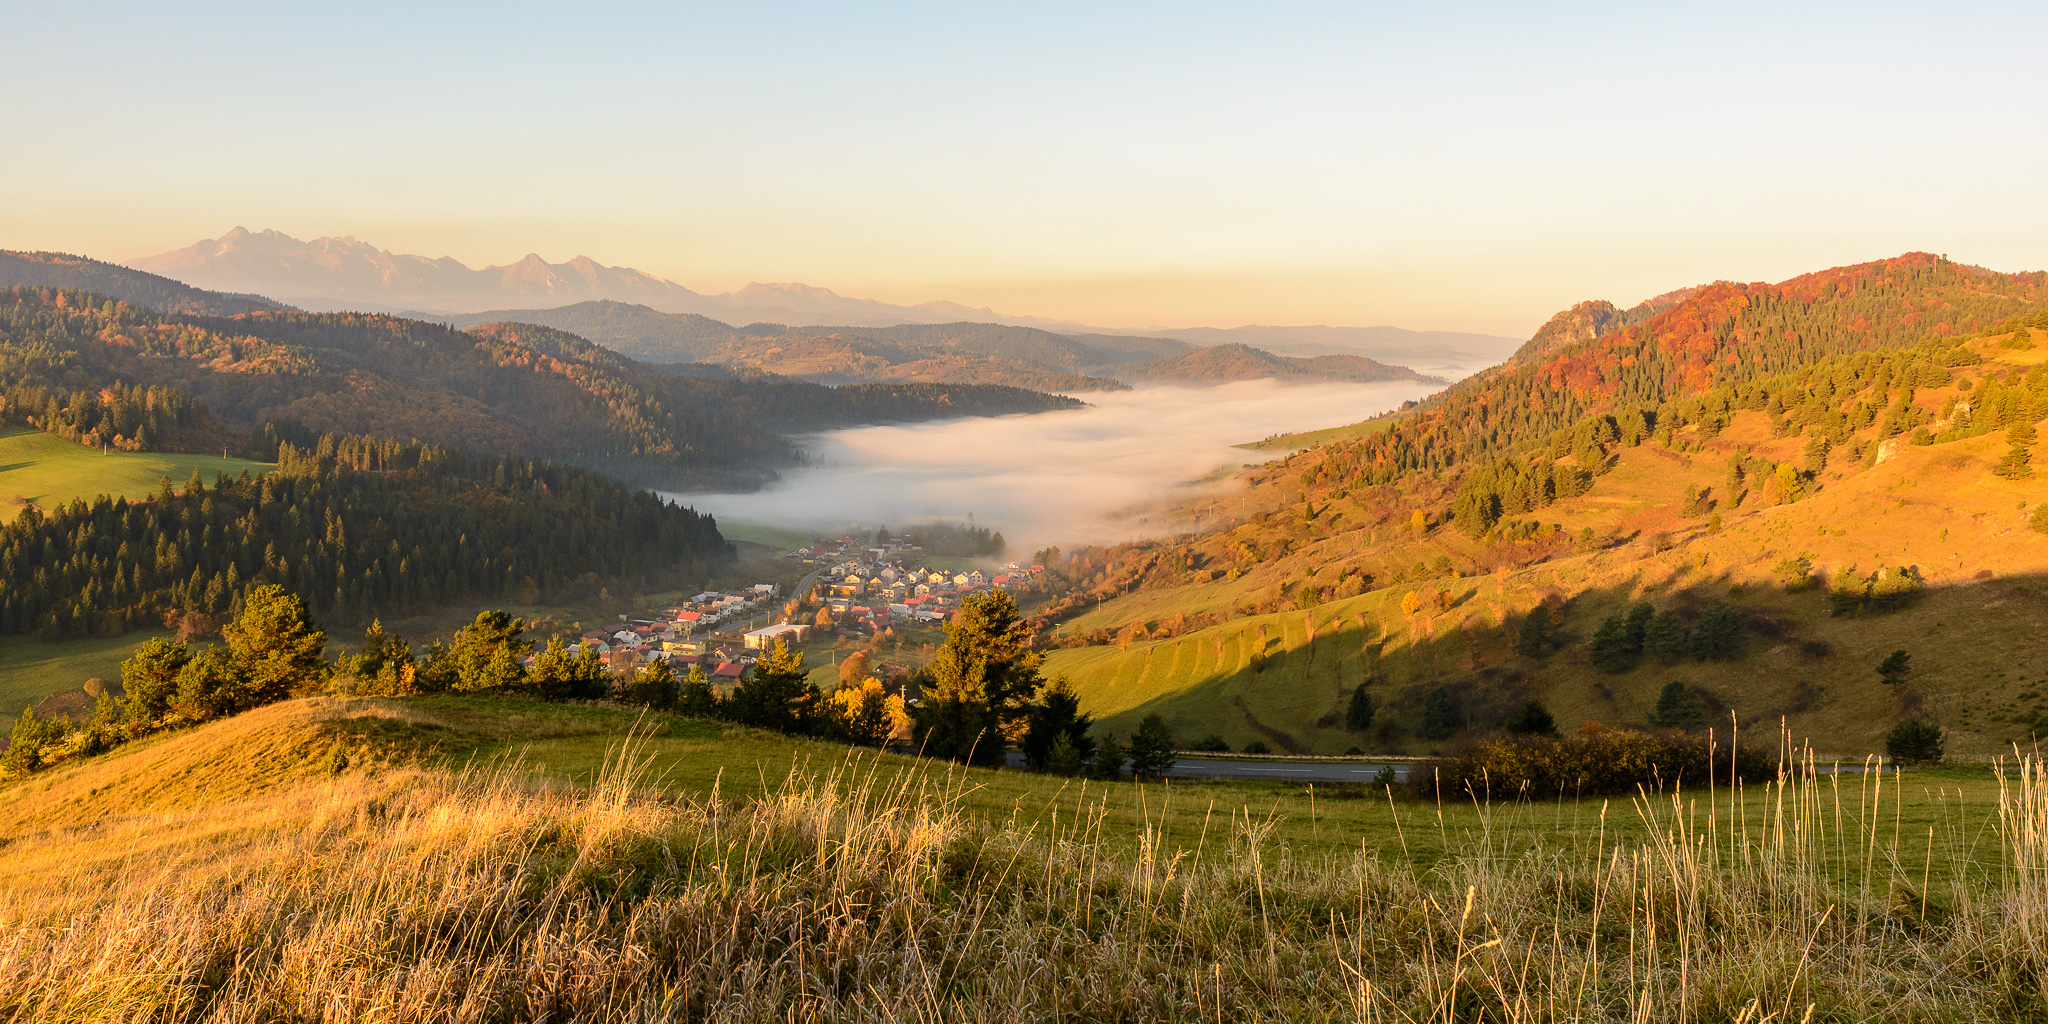 Lesnické sedlo, Slovakia (Slovak Republic)